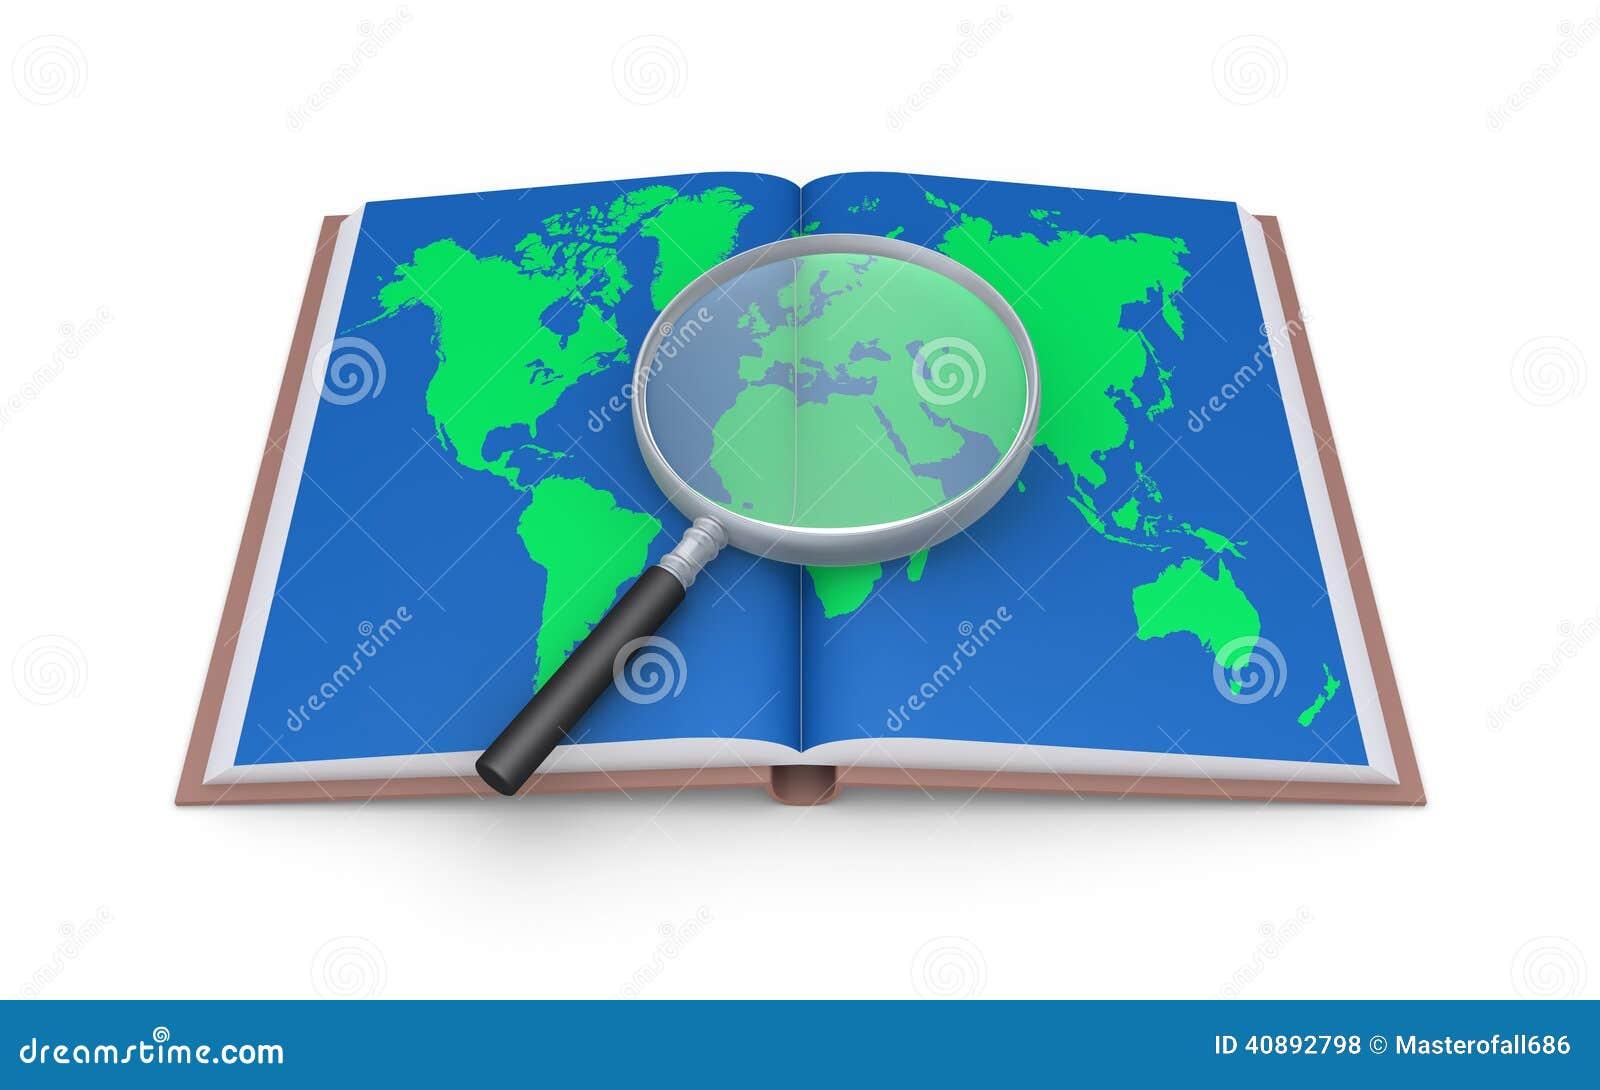 atlas world map book pdf free download